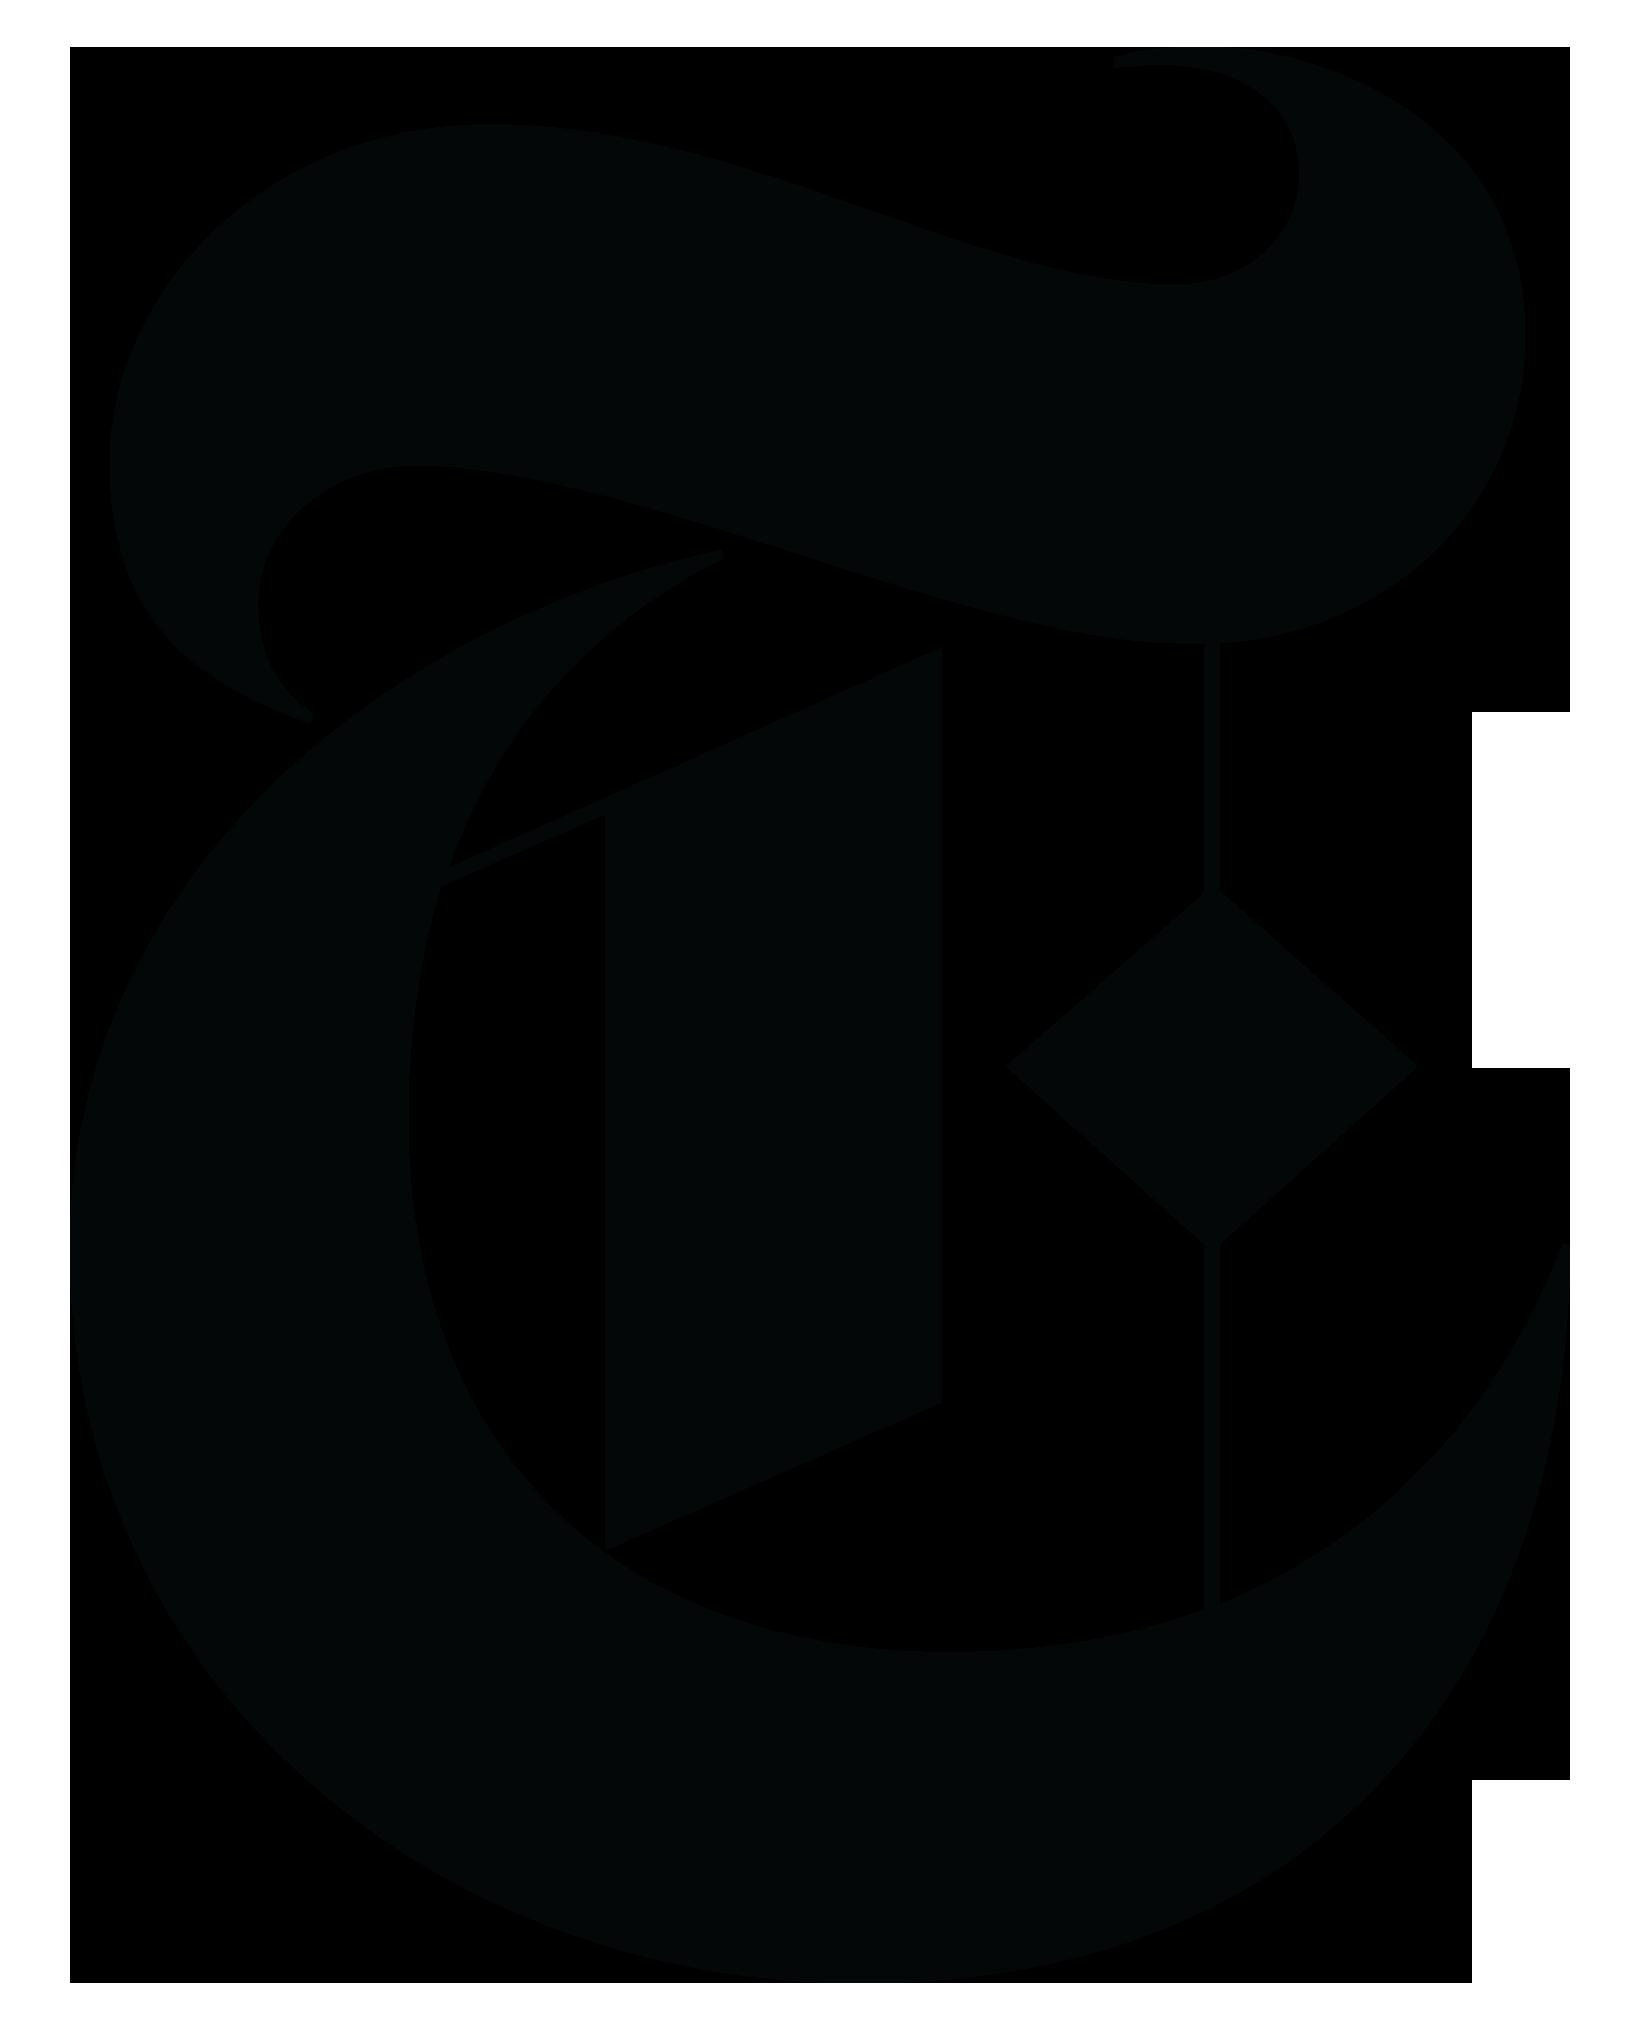 New York Times - Sept 9, 2015